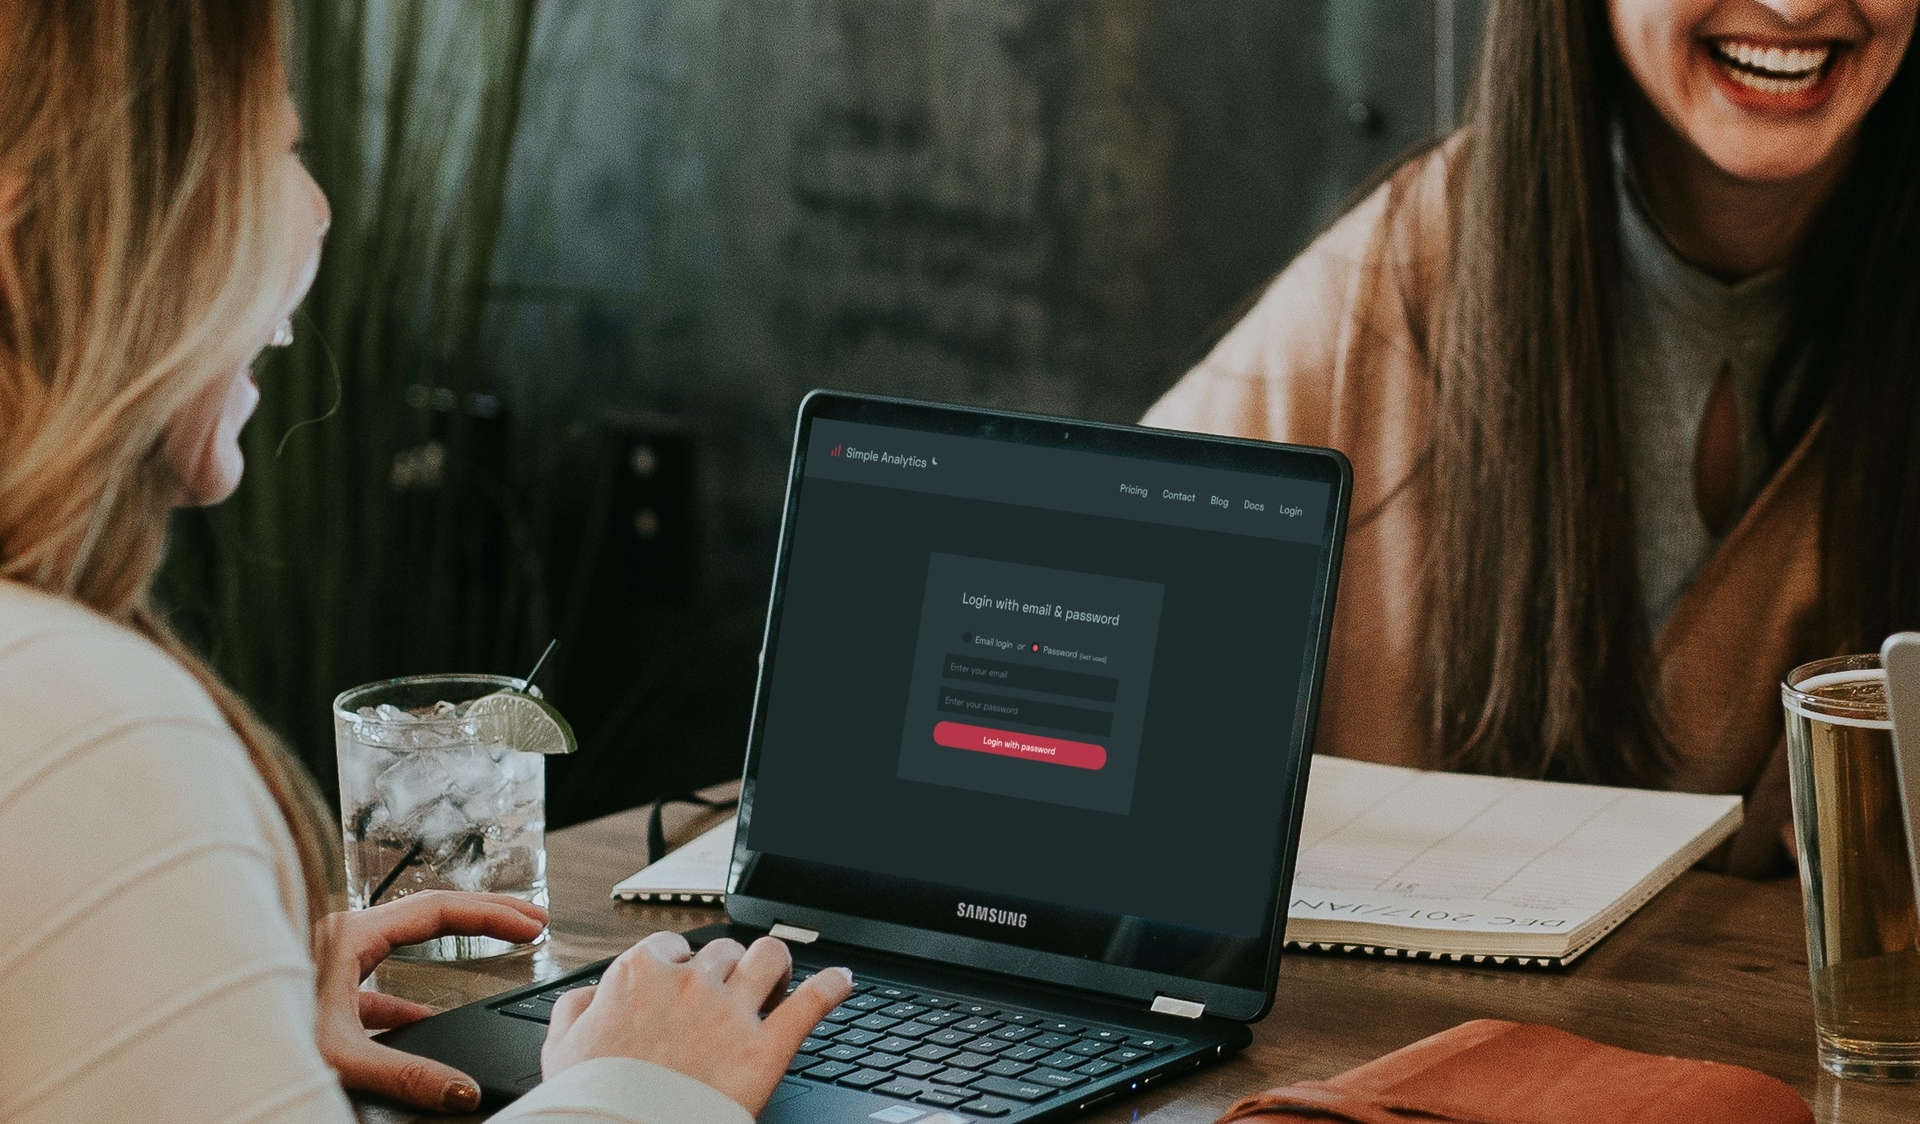 Open Startup Samsung Laptop